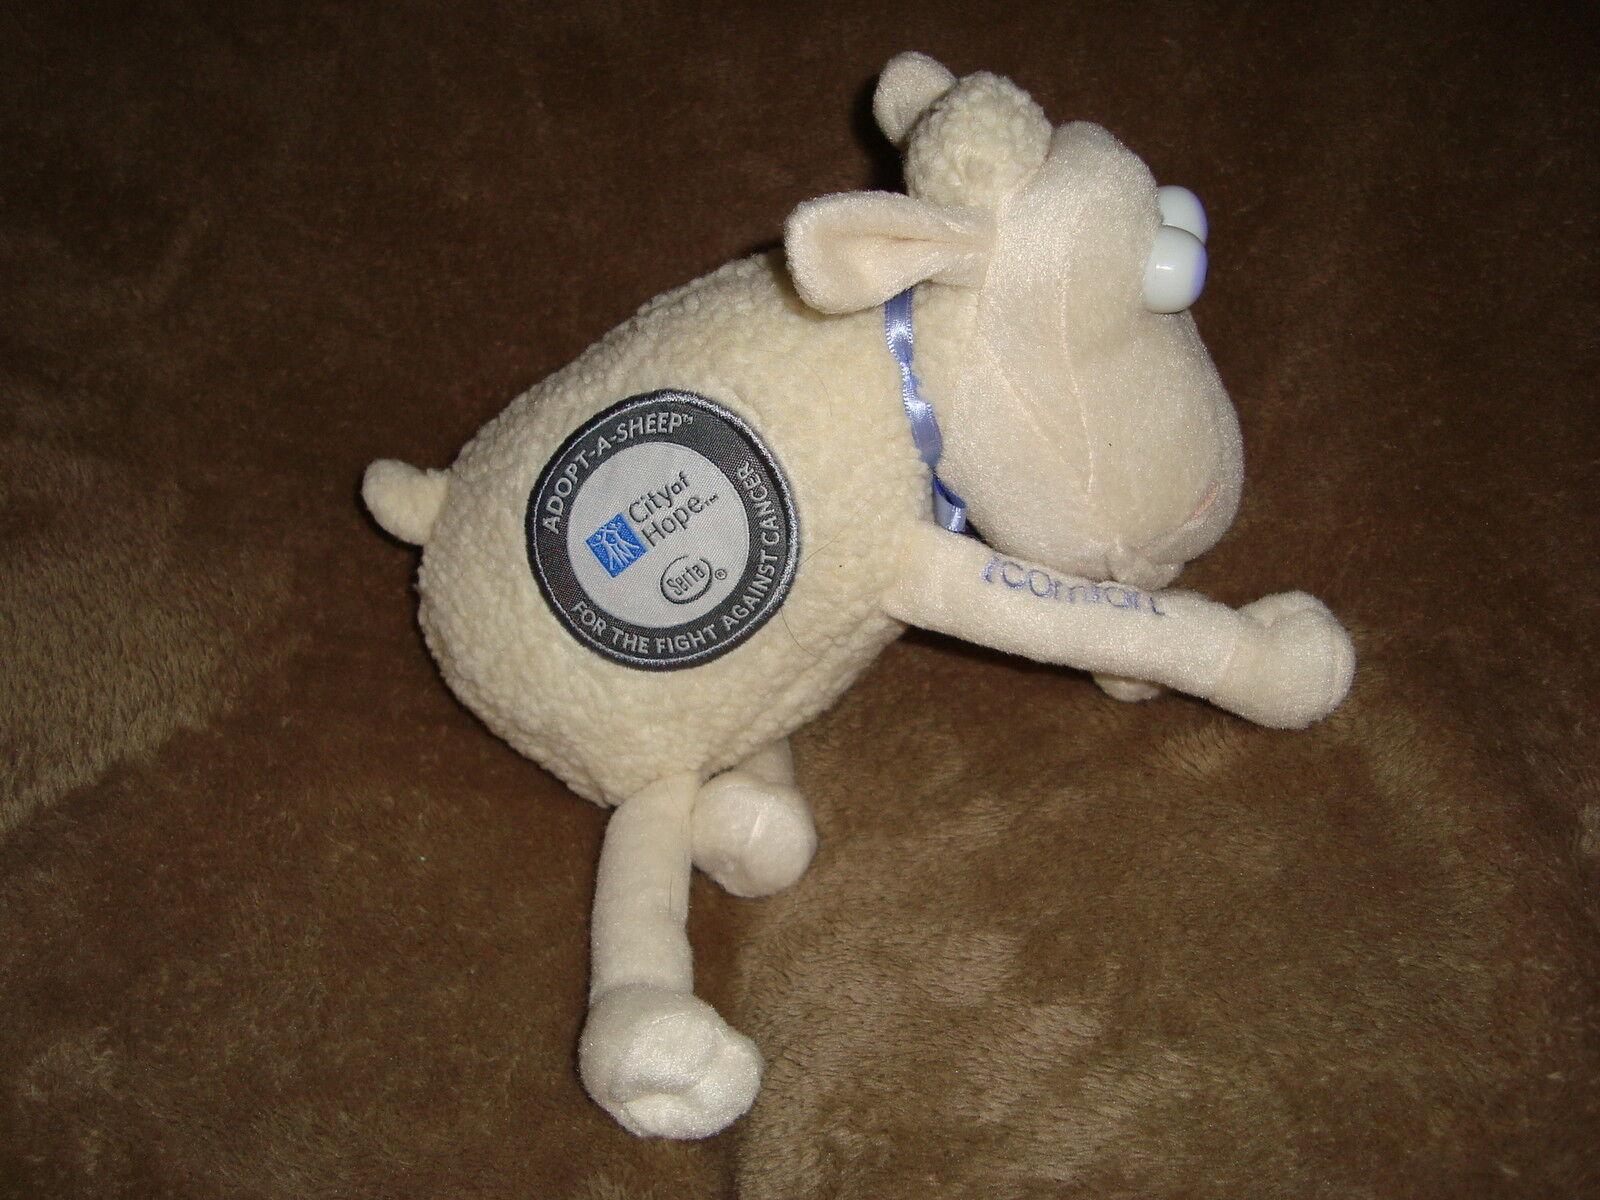 Serta sheep Hope icomfort City of Hope sheep cancer reseach   60 Plush and Beans 8